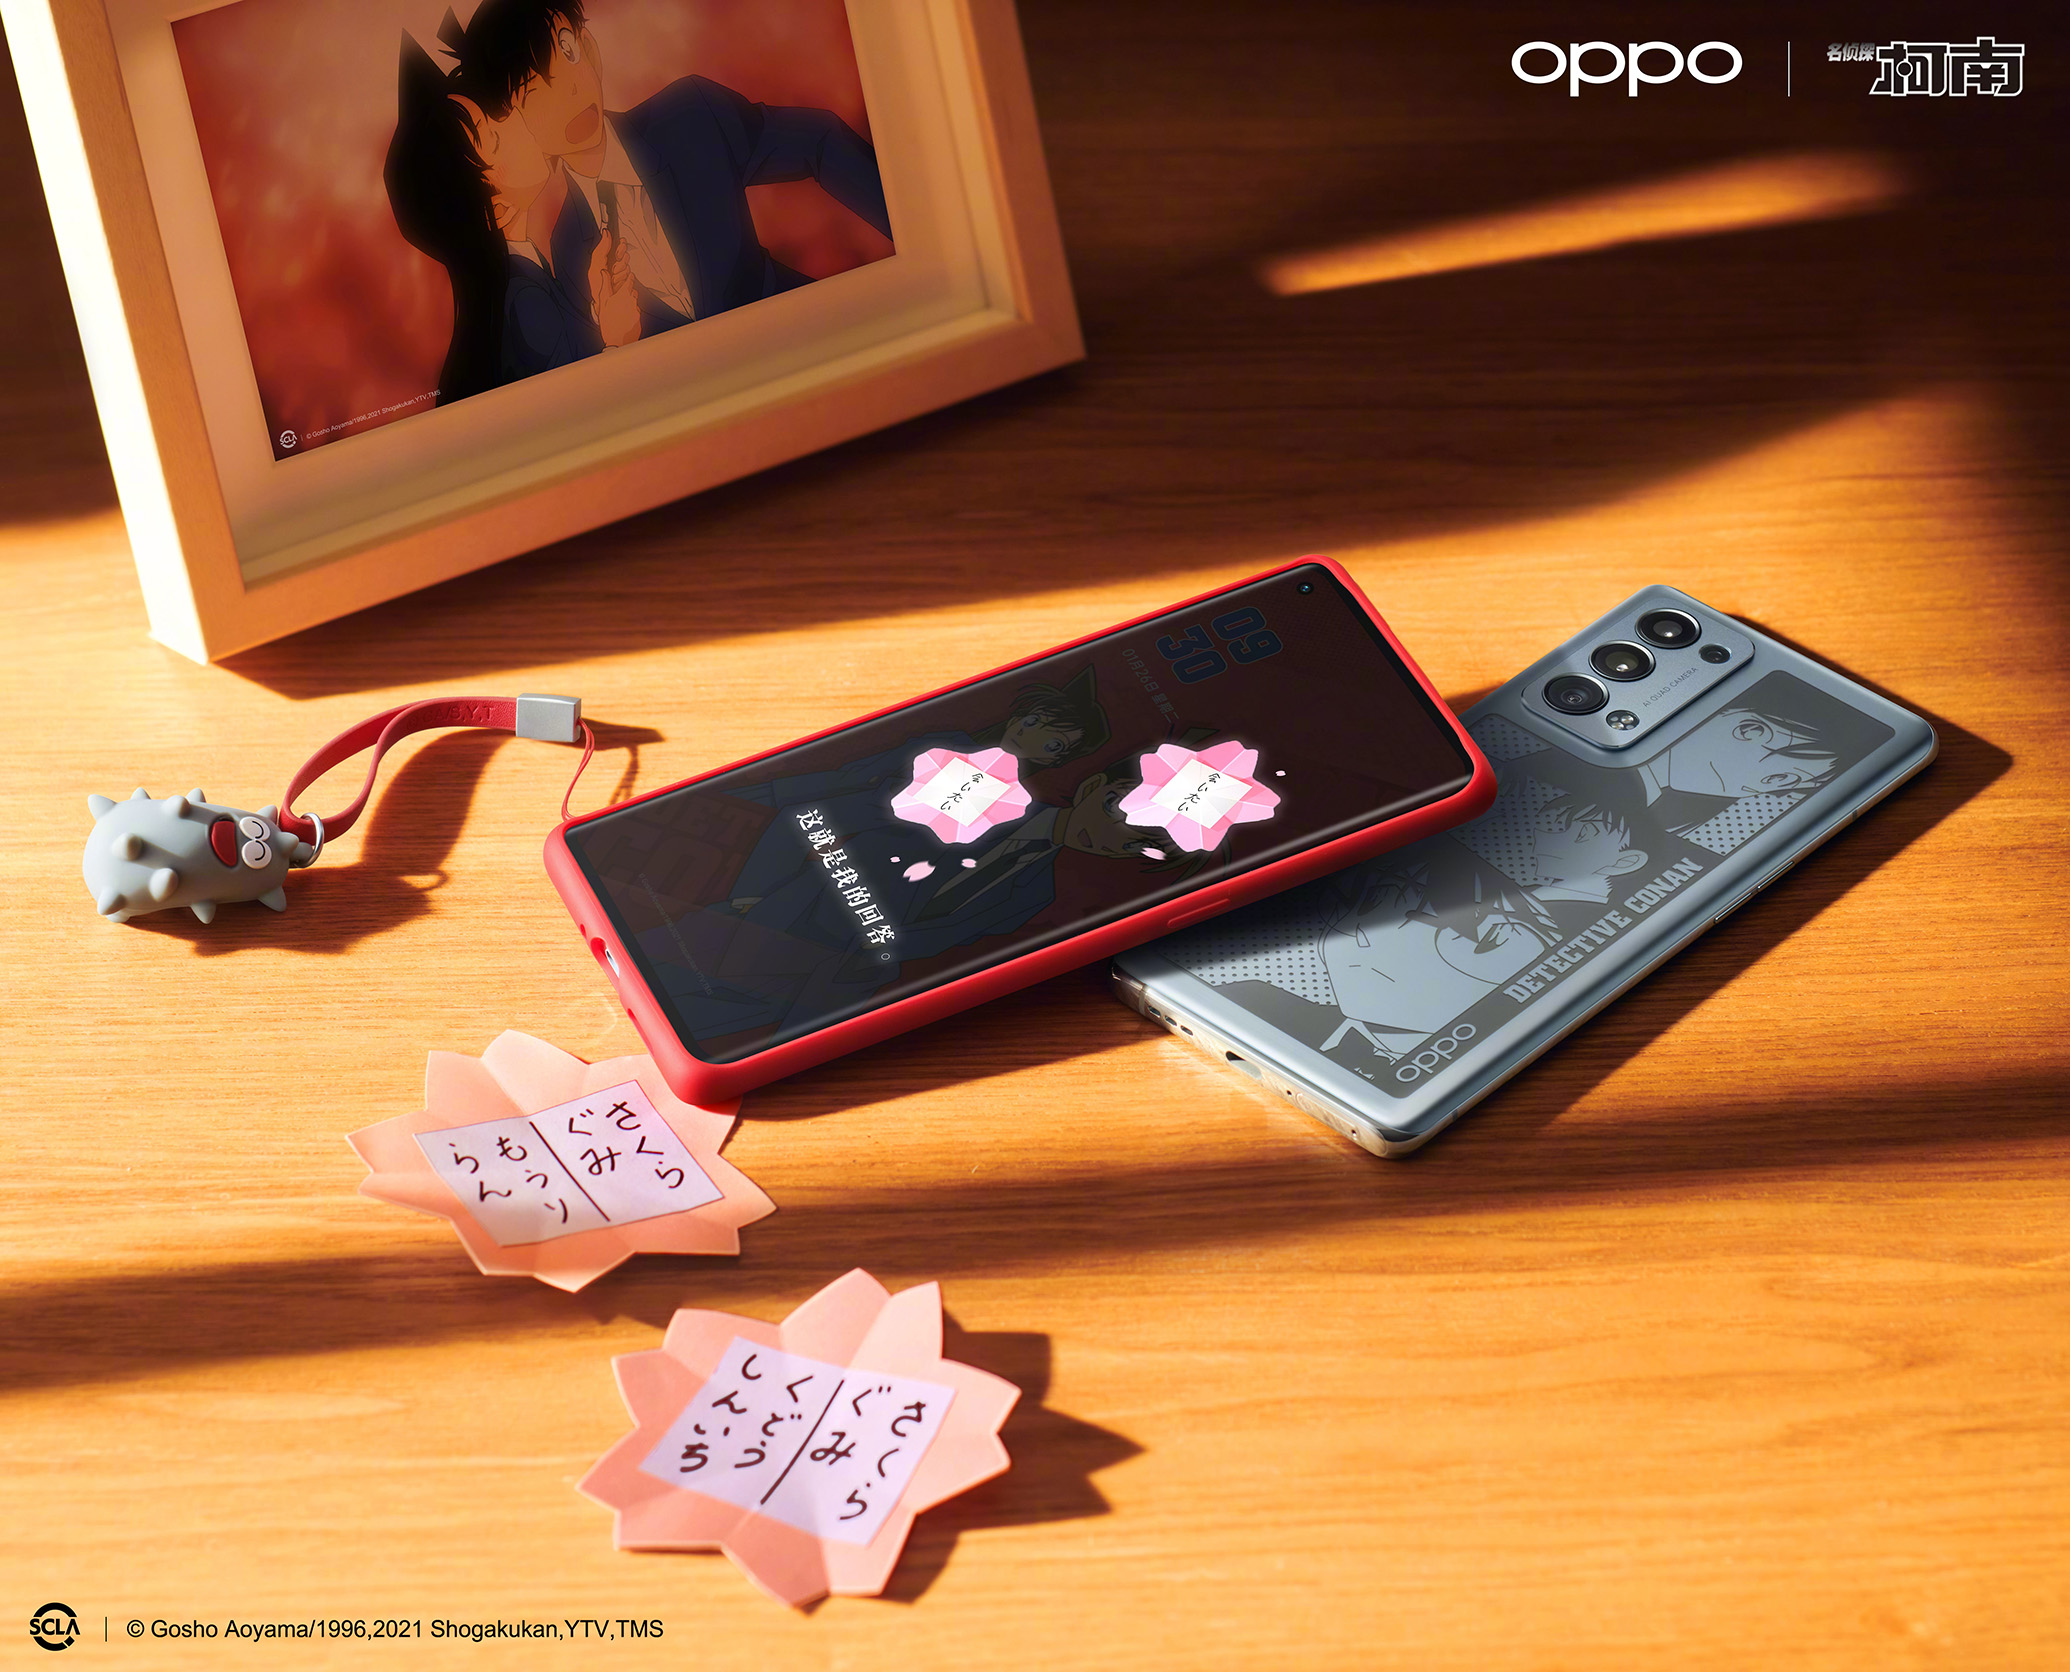 OPPO представила новый Reno 6 Pro+ Другие устройства  - dla_nastoaschih_cenitelej_oppo_predstavila_novuu_versiu_reno_6_pro_2